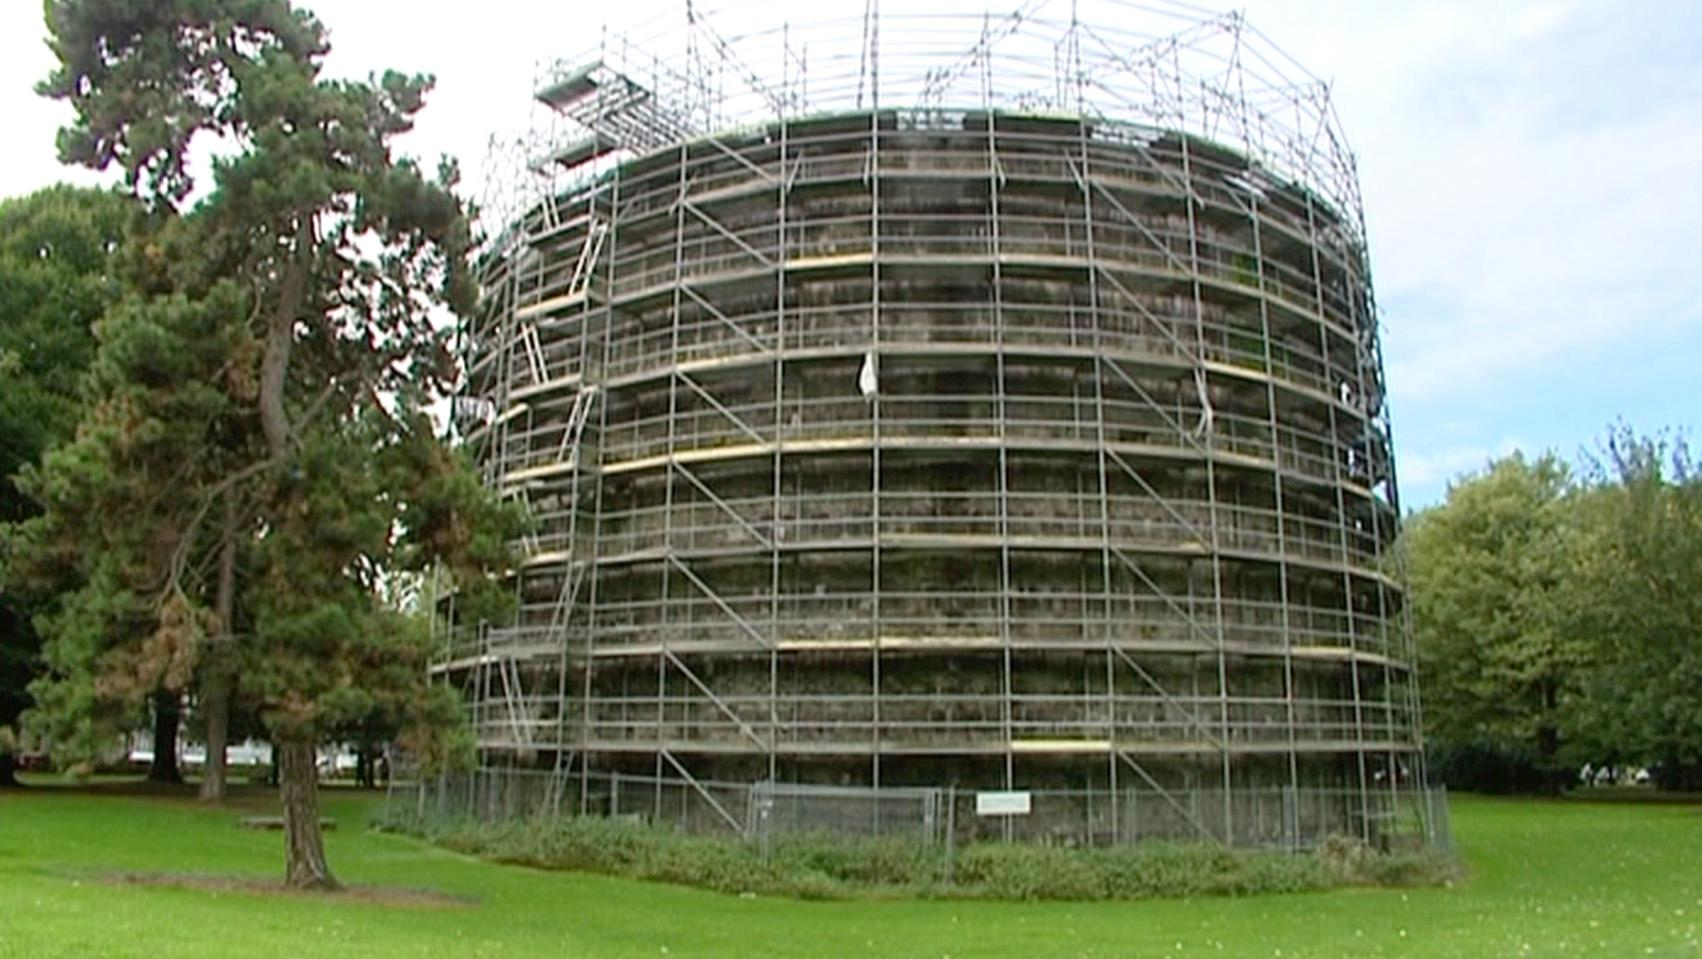 La ville de Tournai rachète la Tour Henri VIII